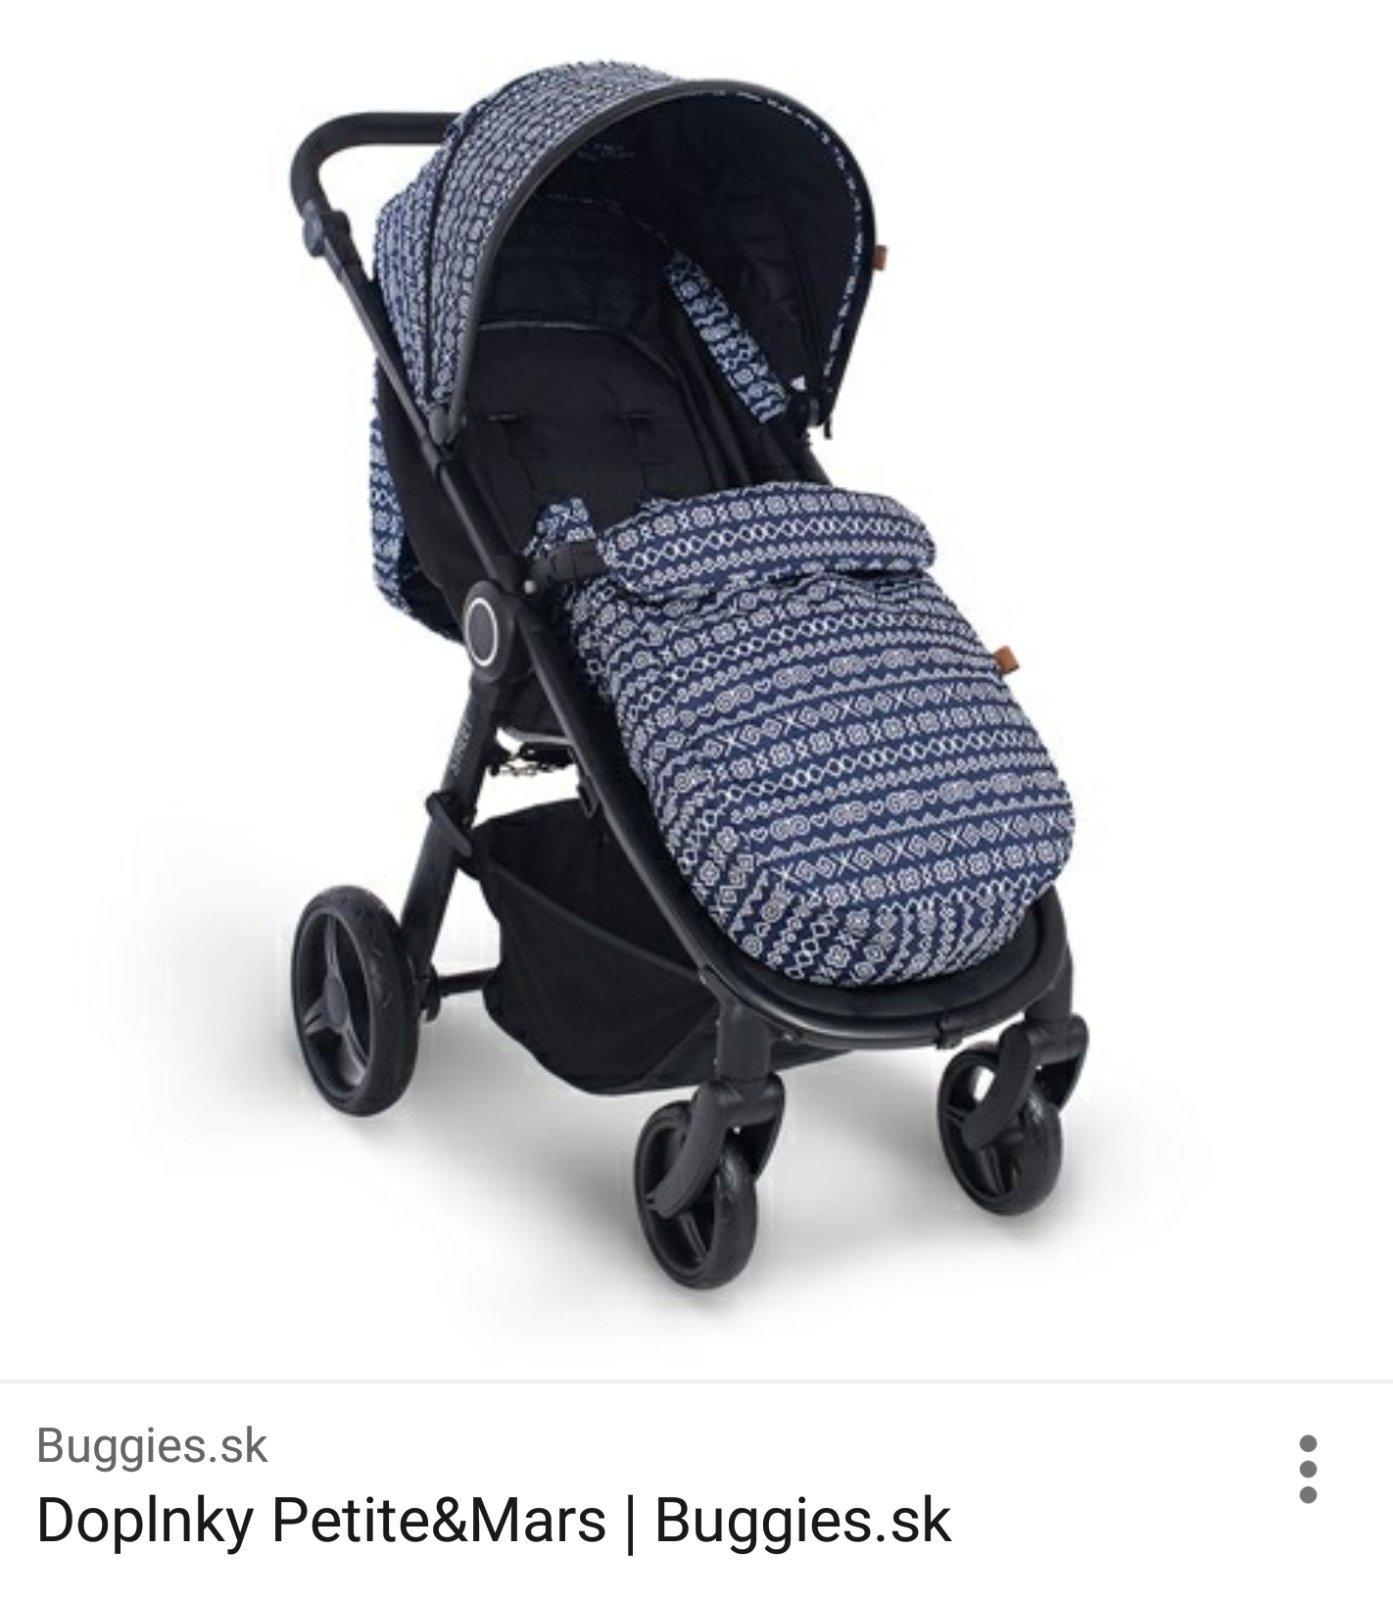 Kočík Britax verzus Petite Marse - Modrý koník 3a8c91c67a8